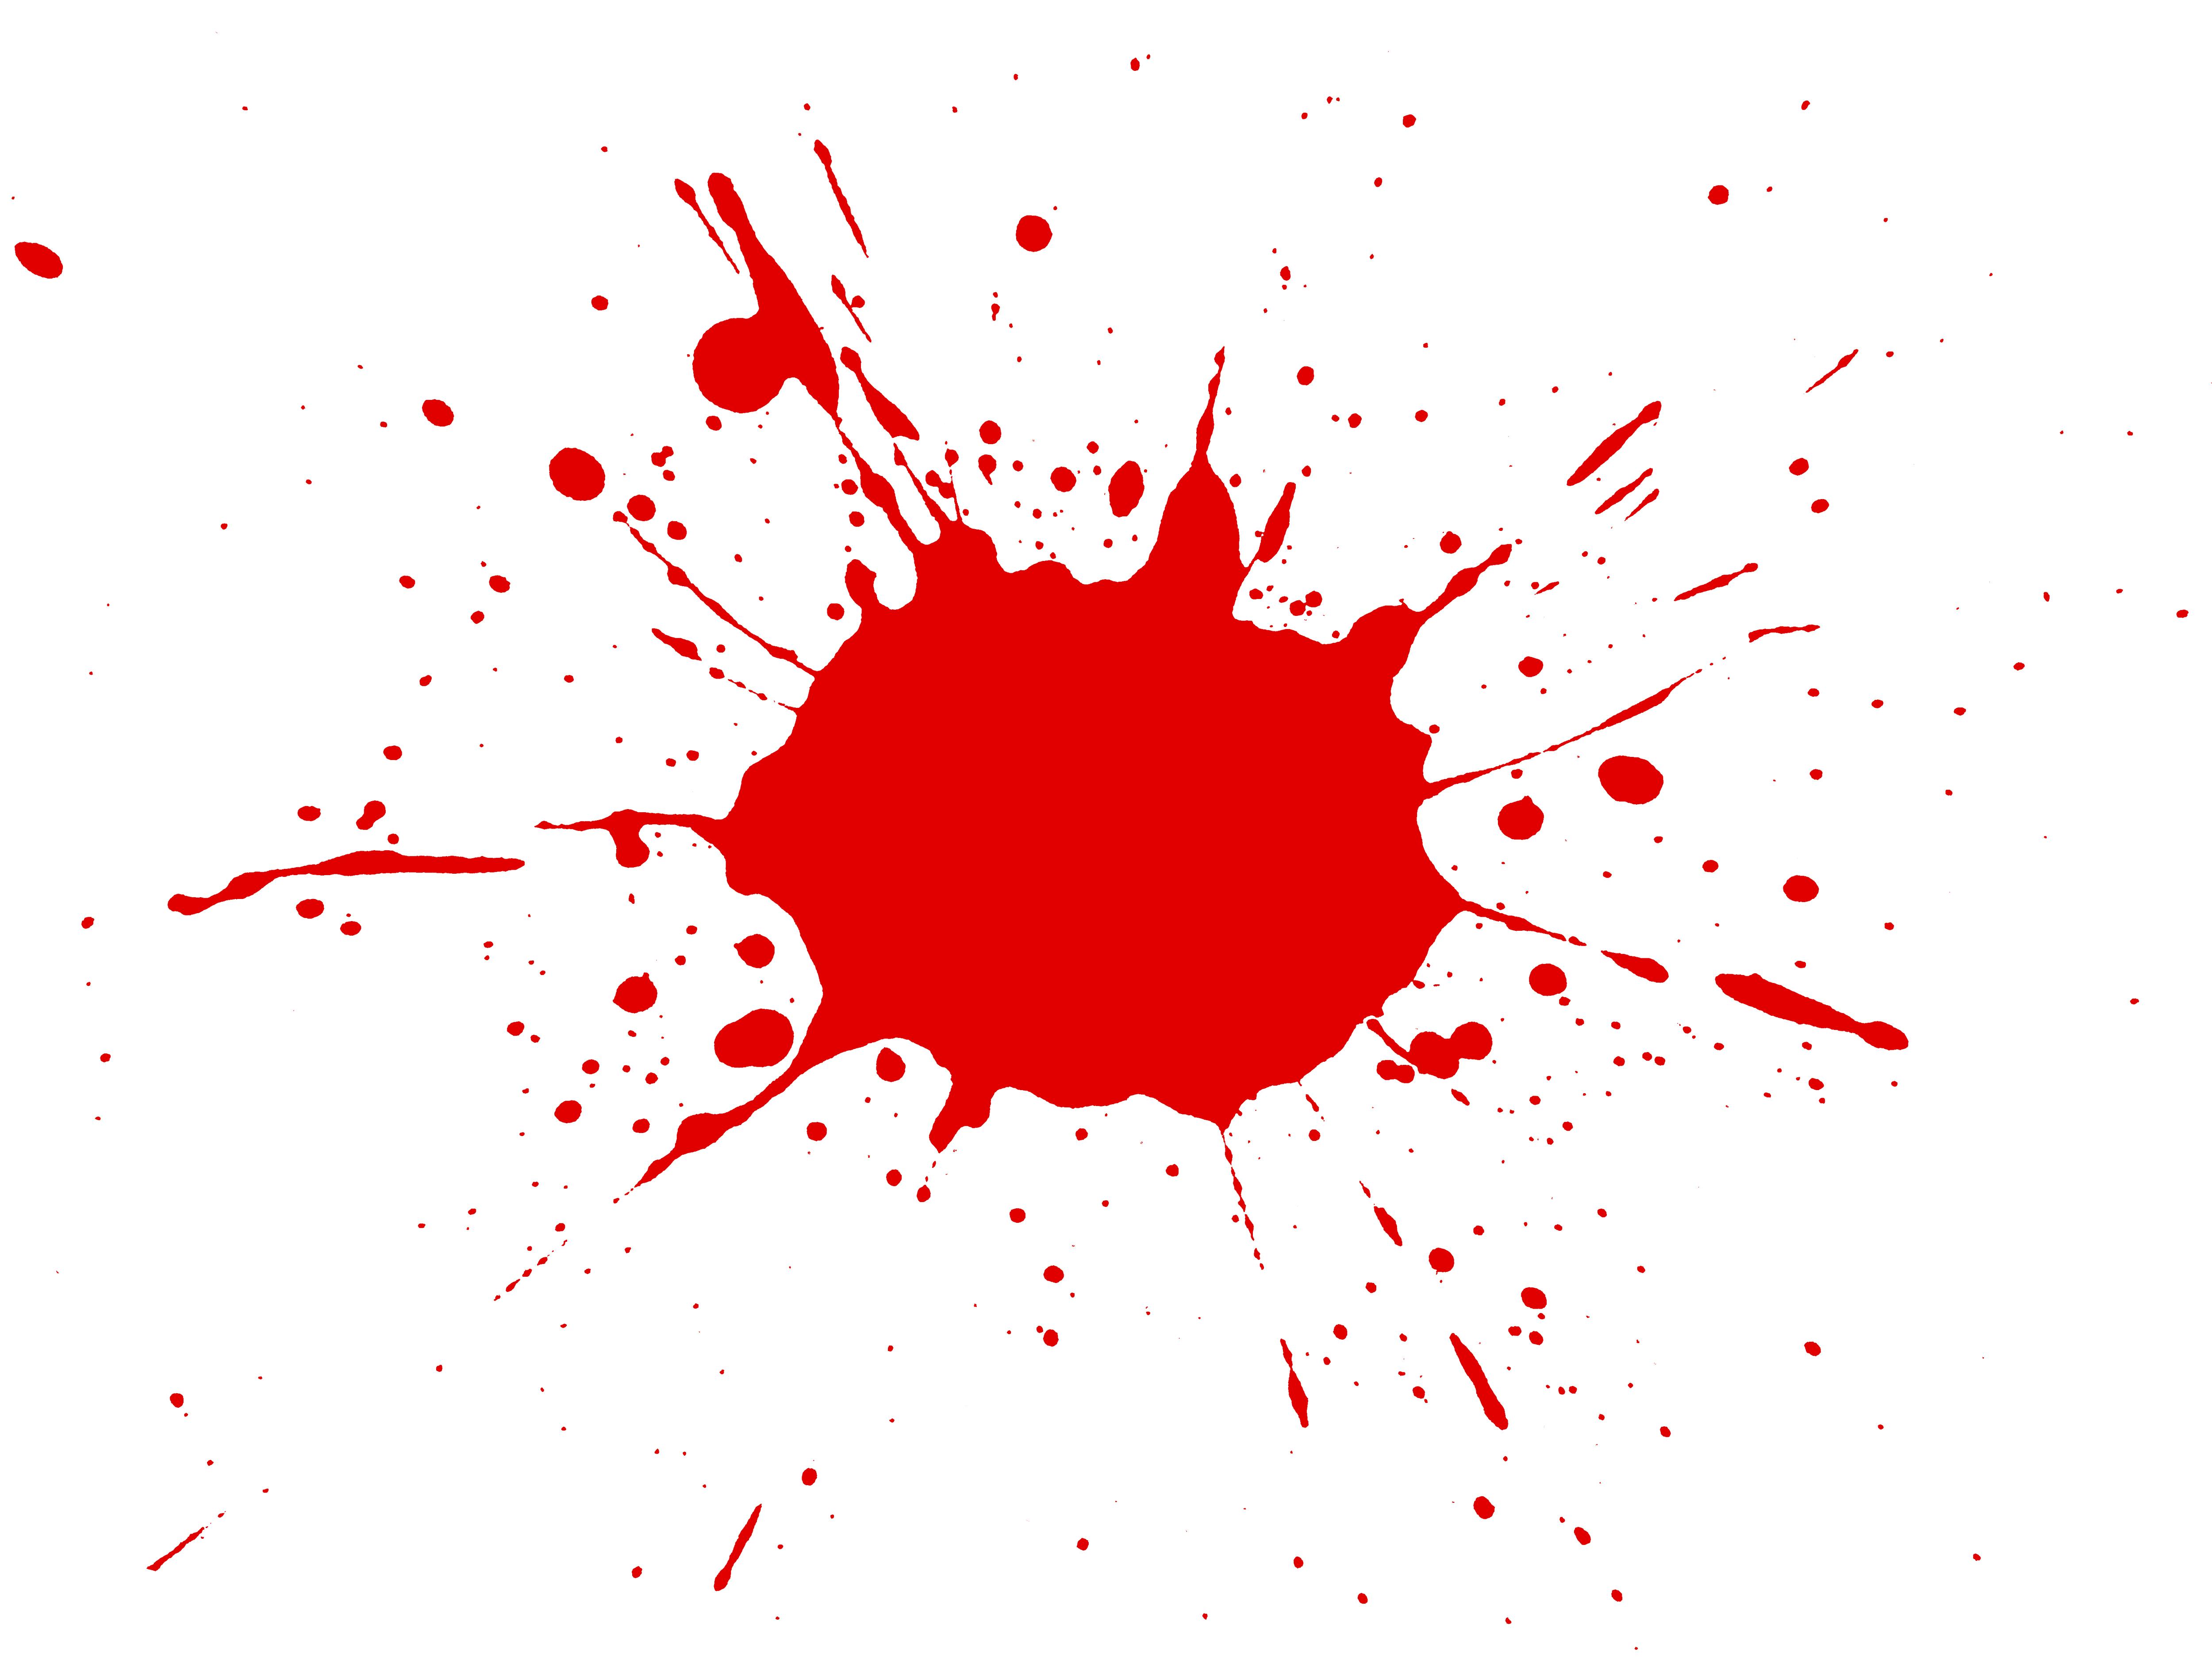 5000x3750 Red Clipart Splat